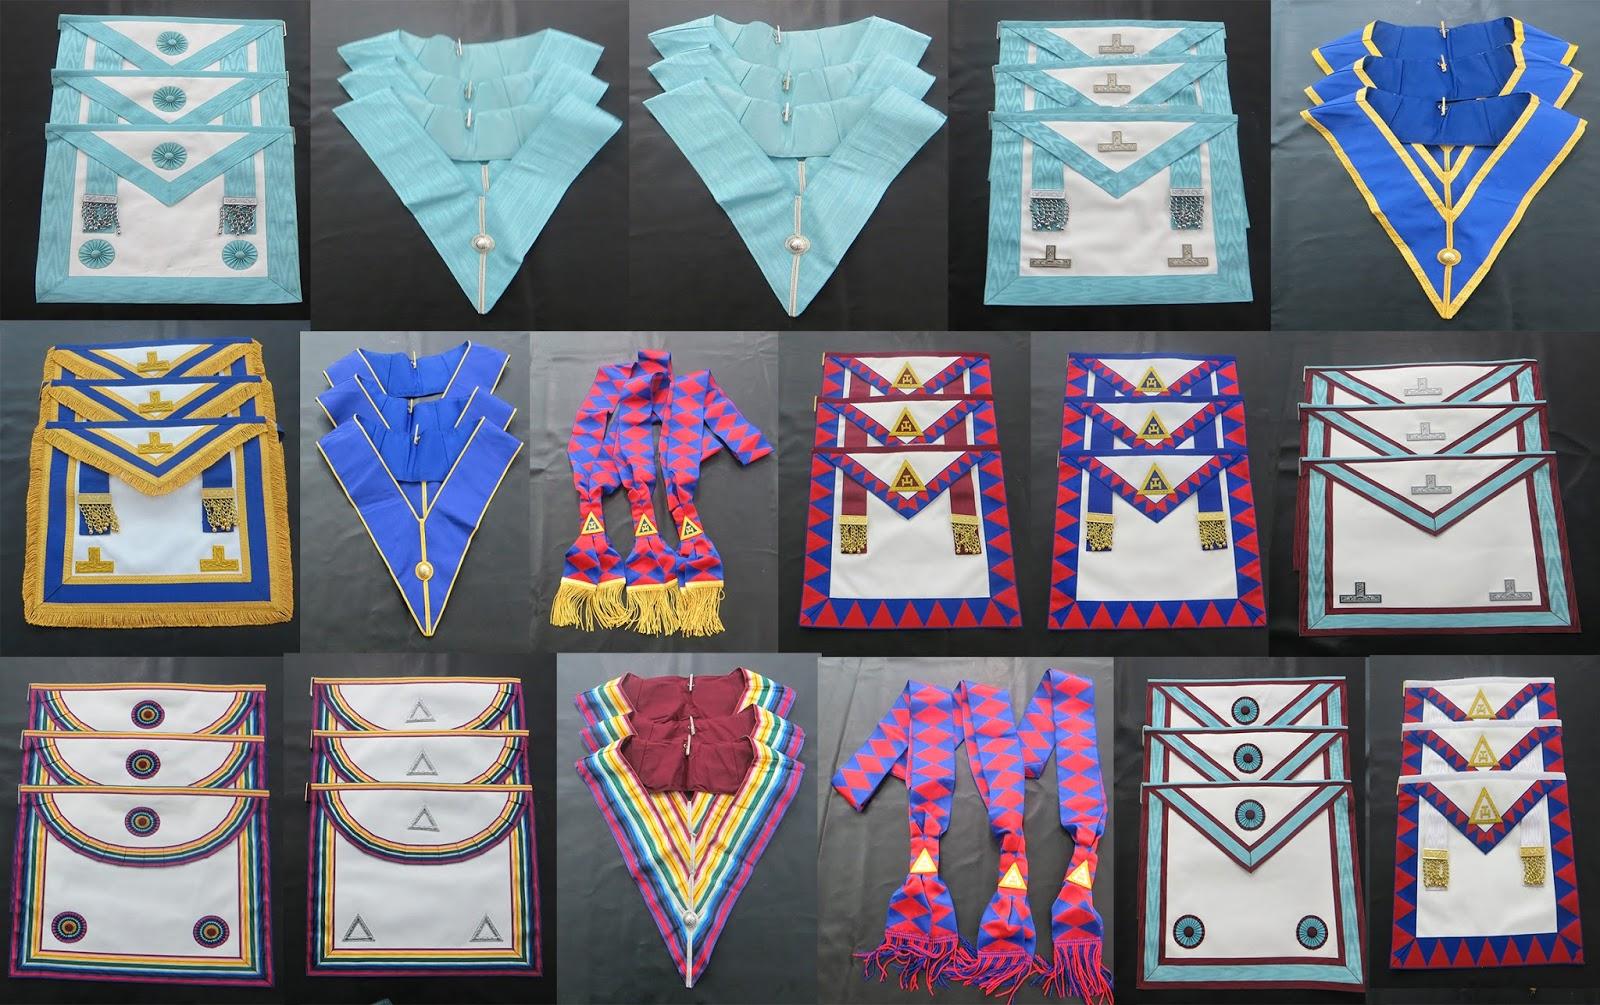 Craft master mason apron, craft worshipful apron, craft officer